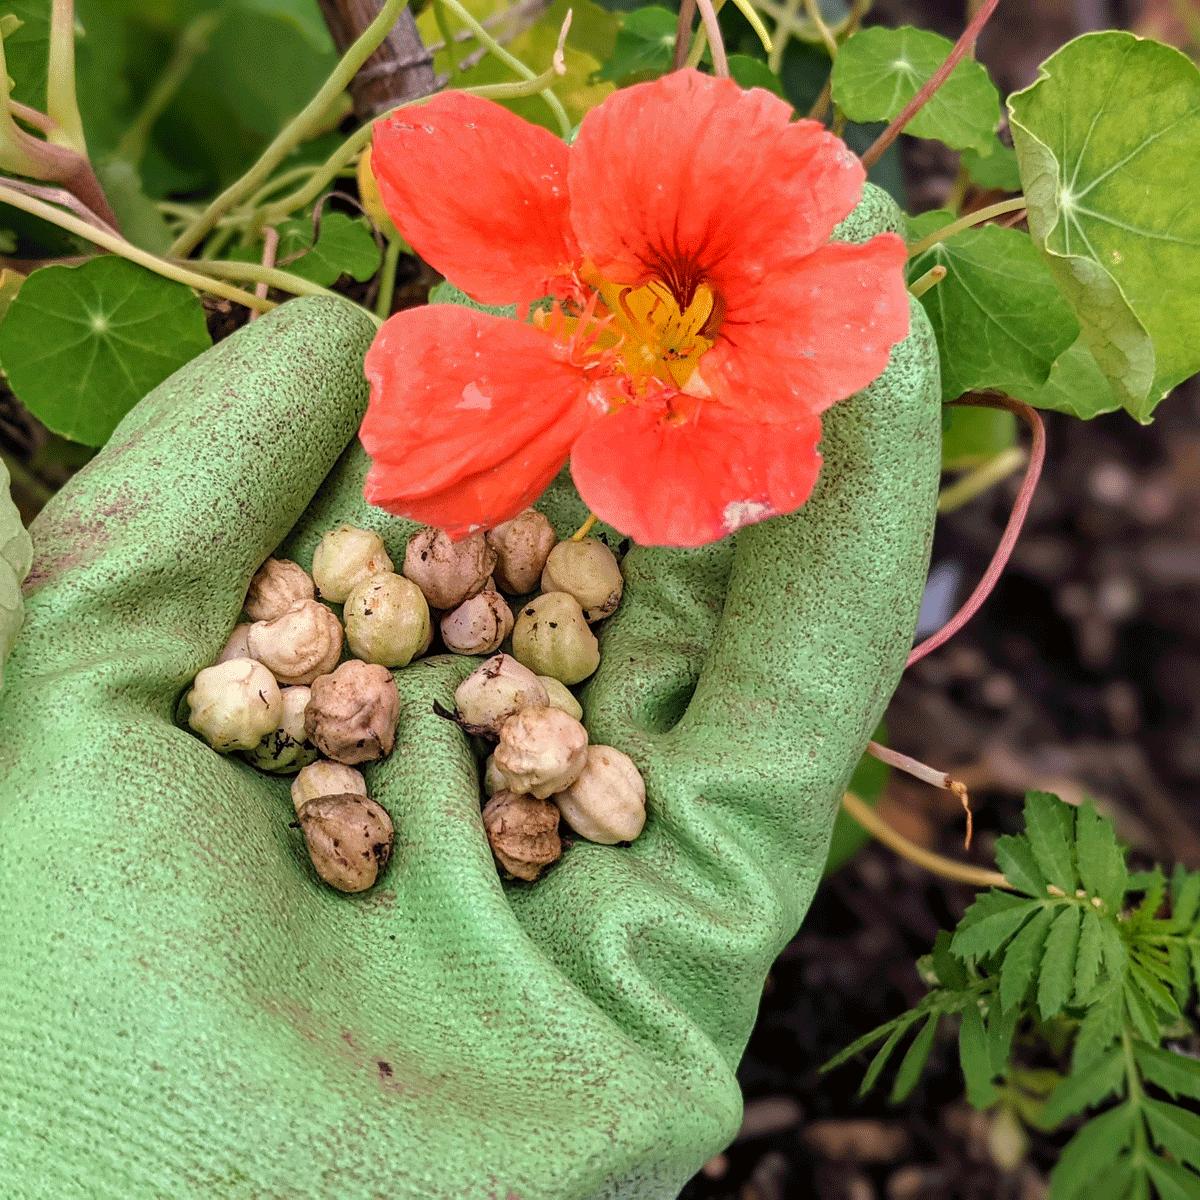 Harvesting Nasturtium Seeds | 4 Easy and Fun Steps